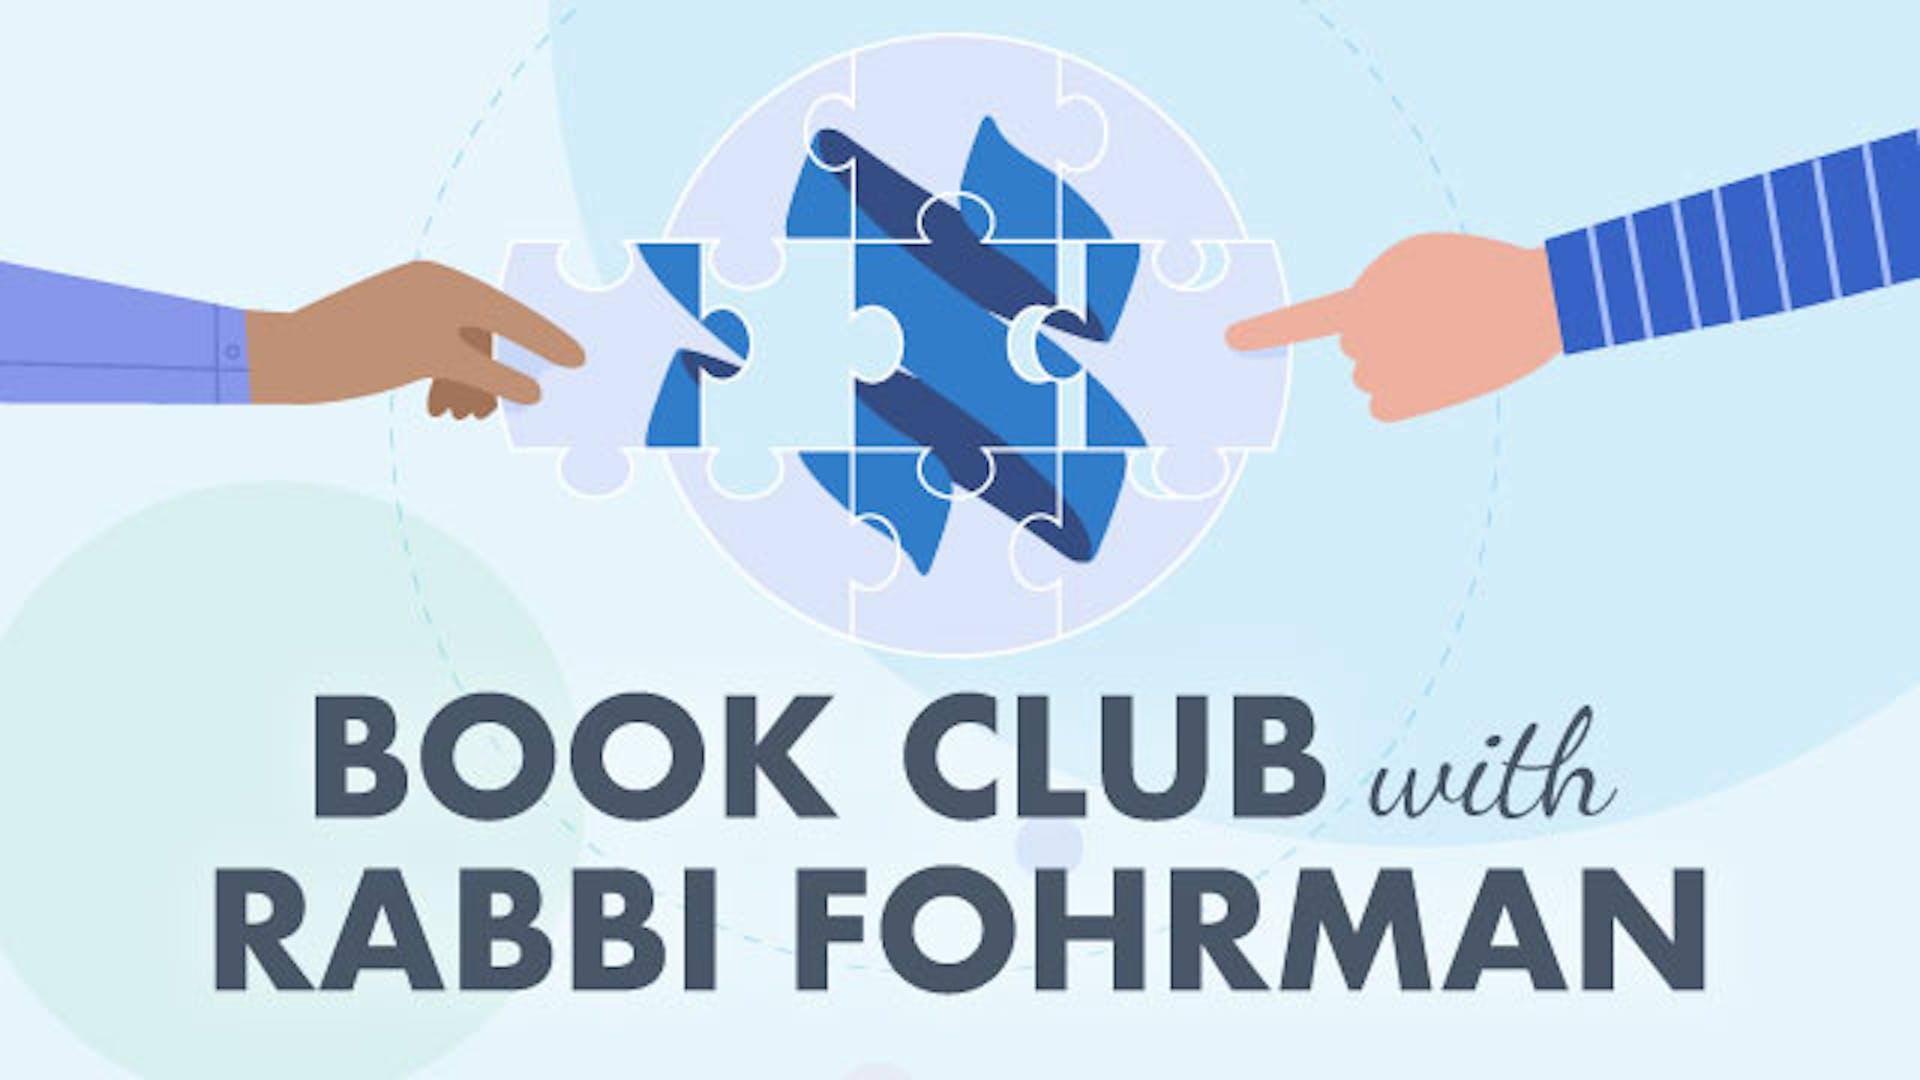 Book Club with Rabbi Fohrman